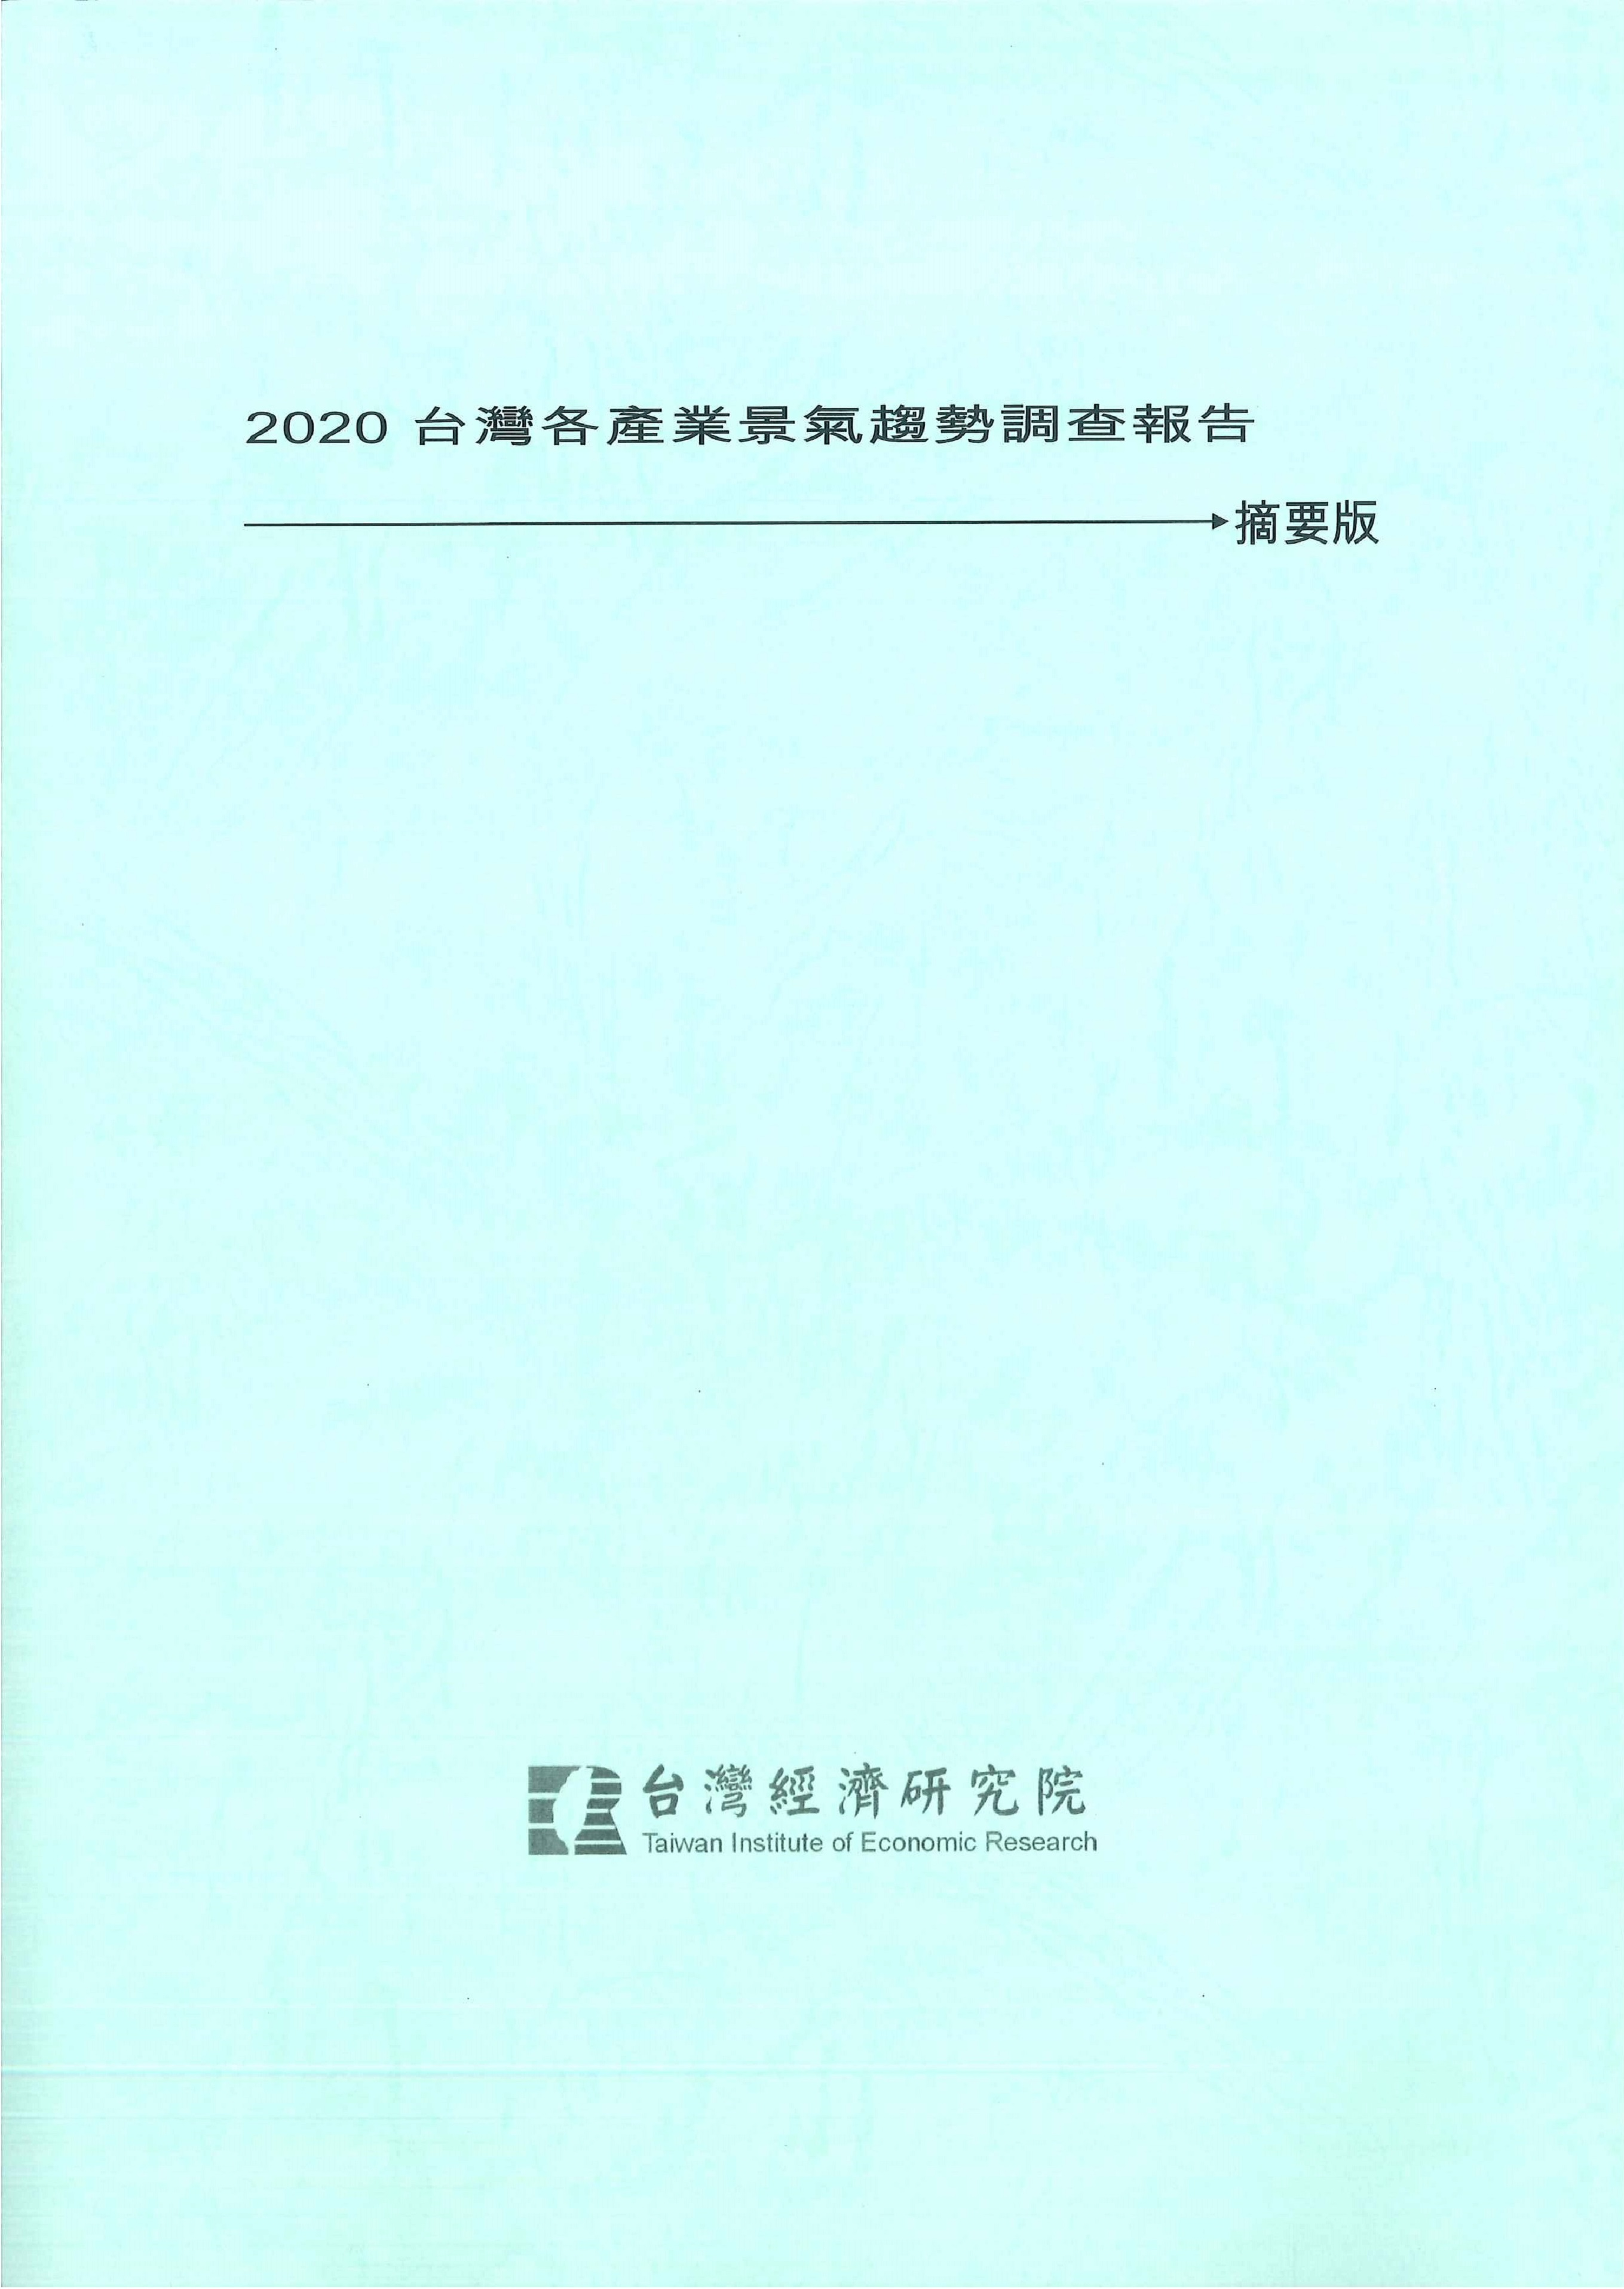 台灣各產業景氣趨勢調查報告=Annual survey on Taiwan industrial trends report